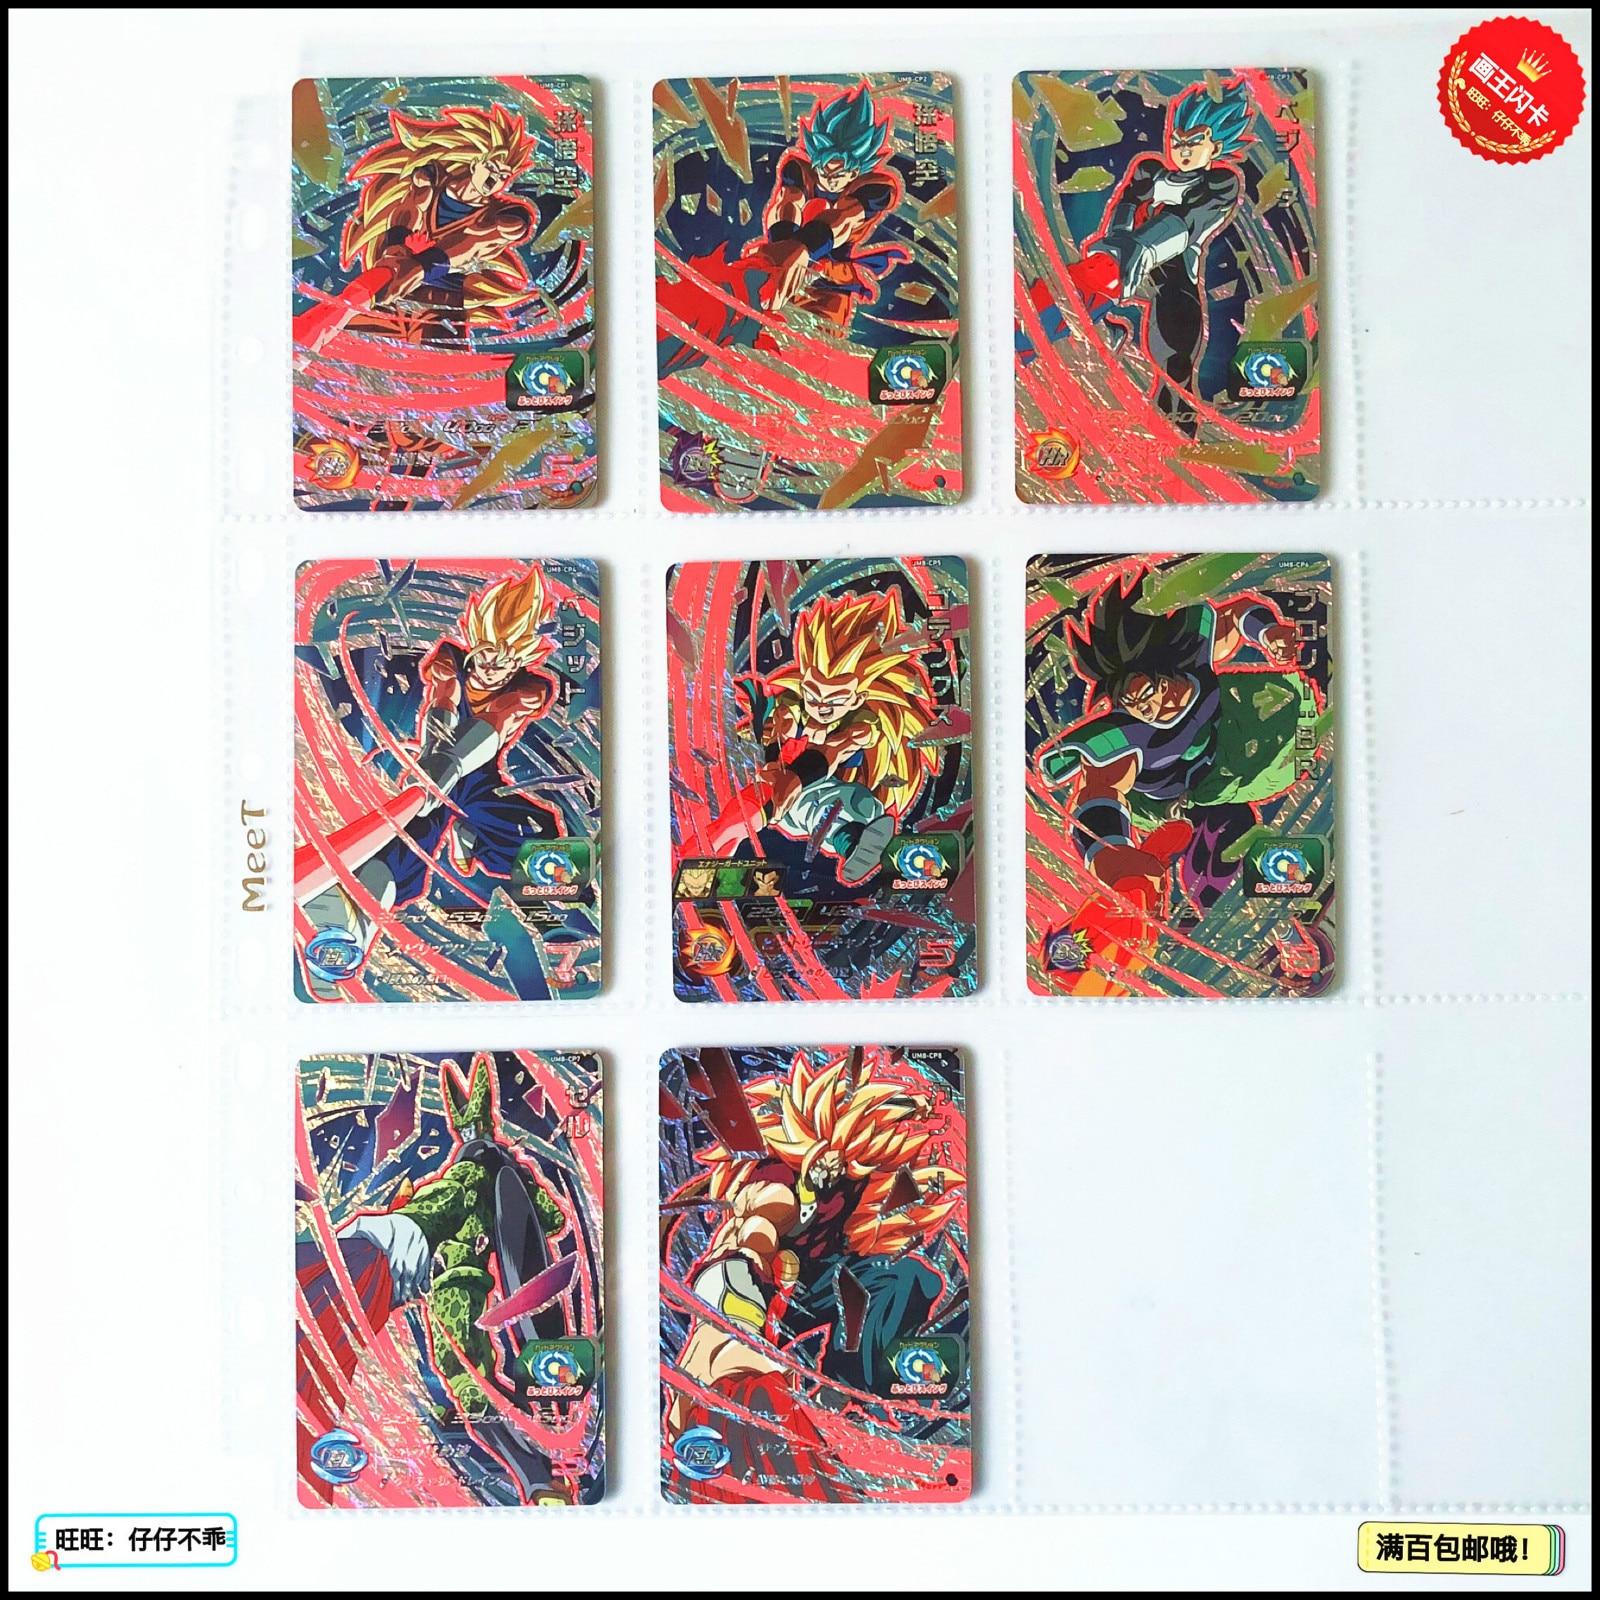 Japan Original Dragon Ball Hero Card UM8 CP Goku Toys Hobbies Collectibles Game Collection Anime Cards